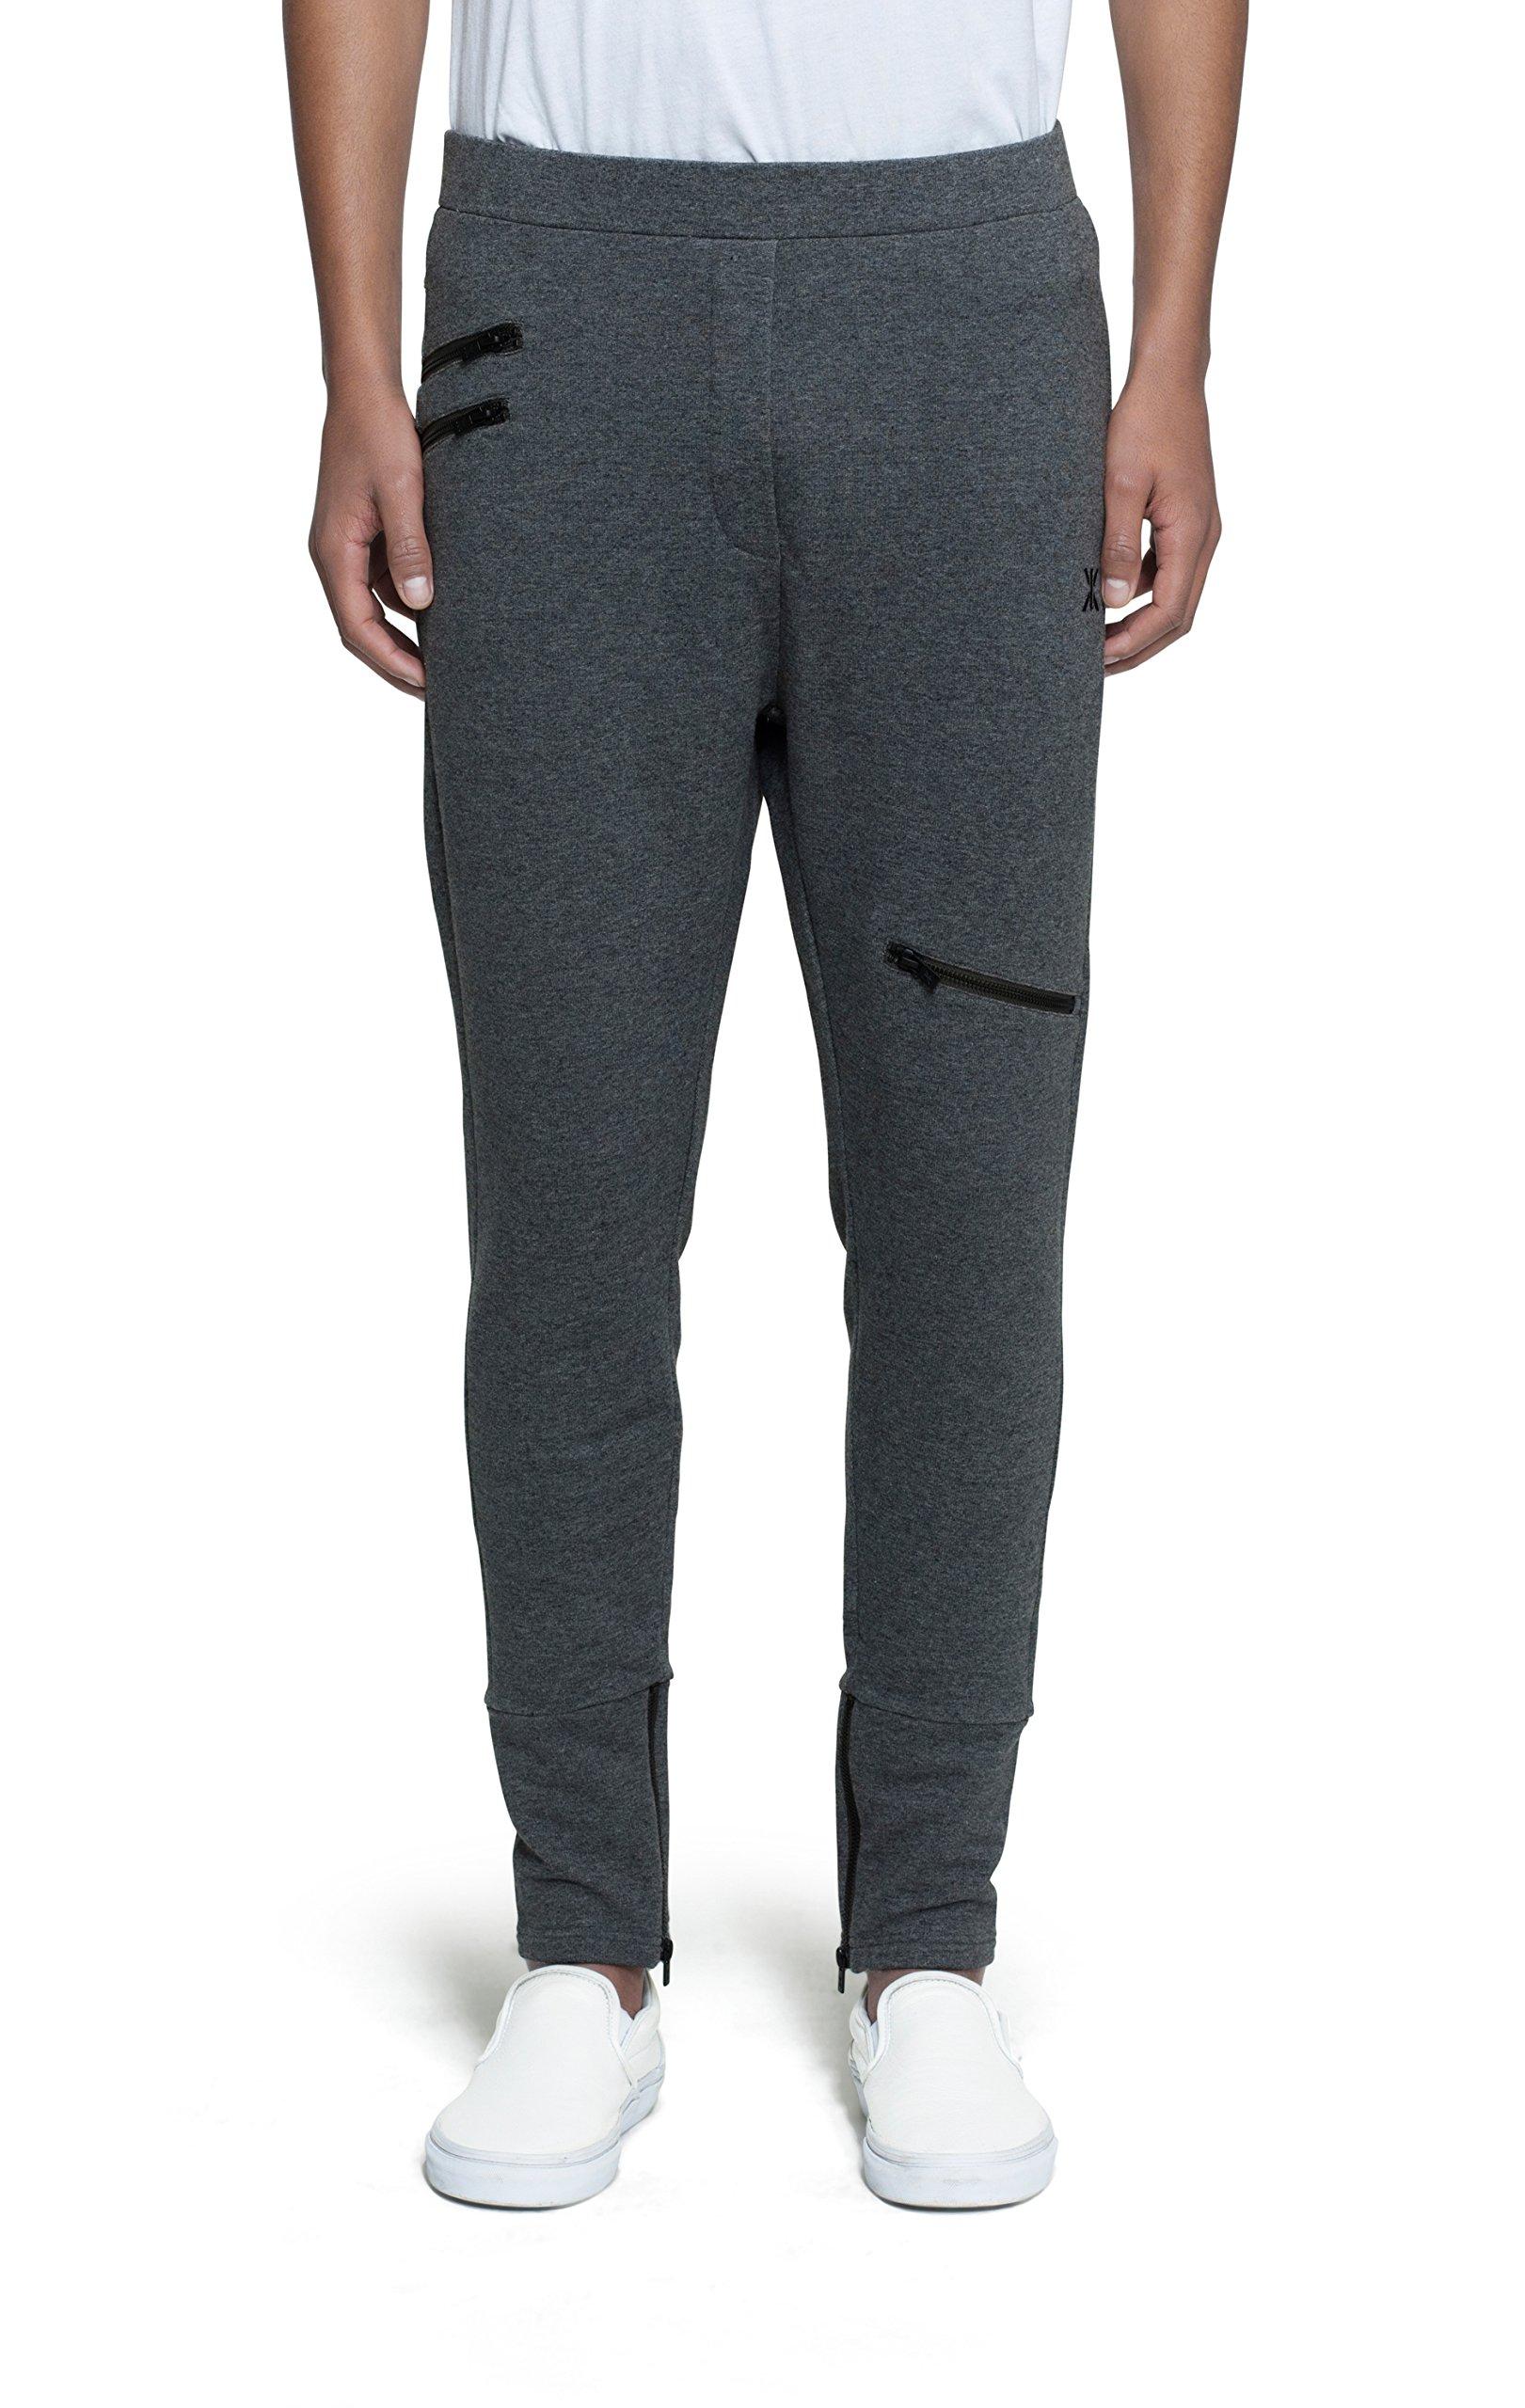 Onepiece De Dark One Grey37w Piece 32ltaille X Pantalon Du FabricantSMixte Pant Out SportGrisnep knXN80wOP